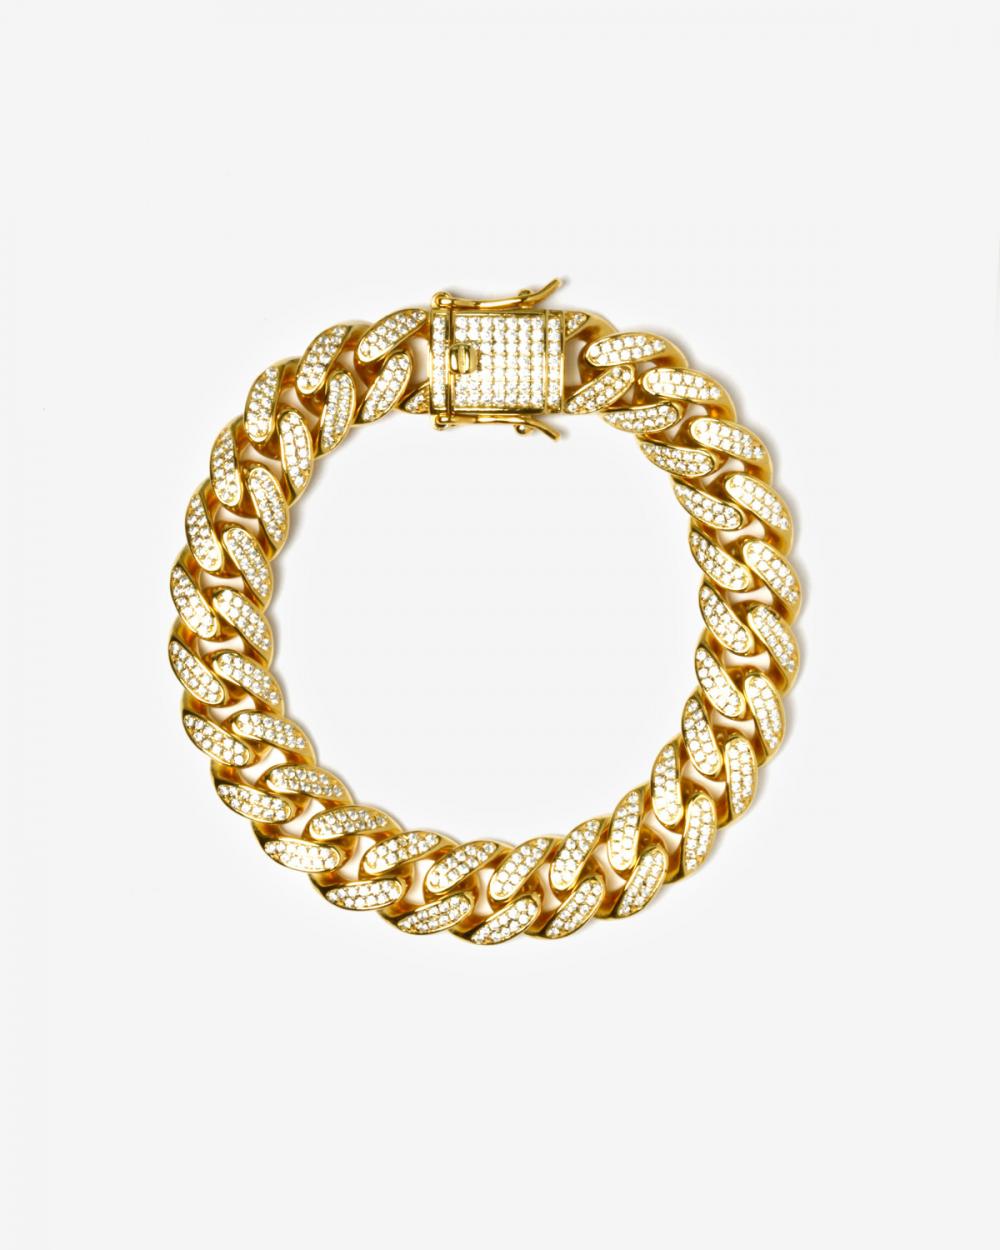 Brilliants H120 YELLOW GOLD OVAL ZIRCON CURB BRACELET NOVE25